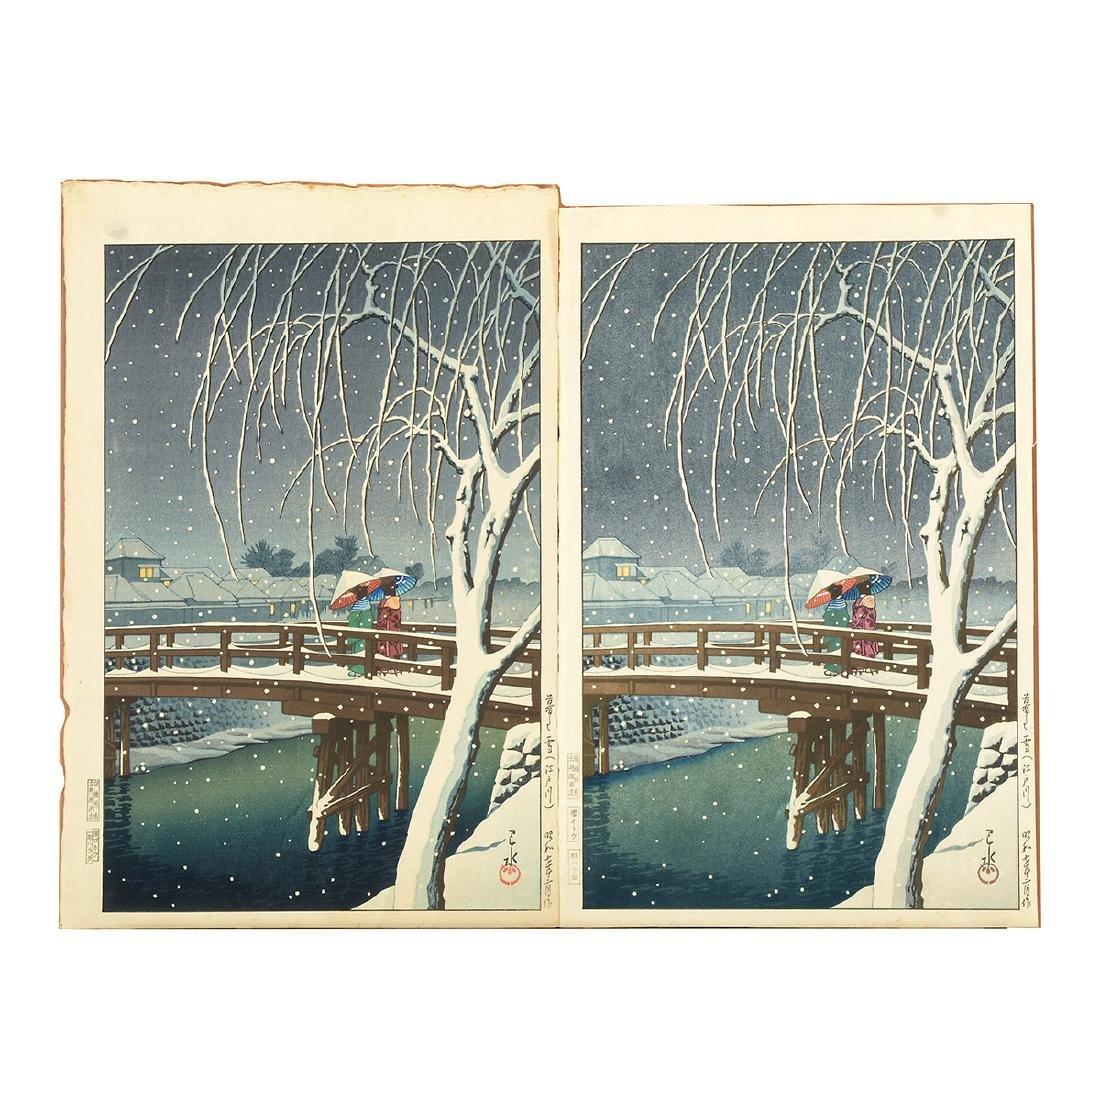 Kawase Hasui (1883-1957): Two Woodblocks